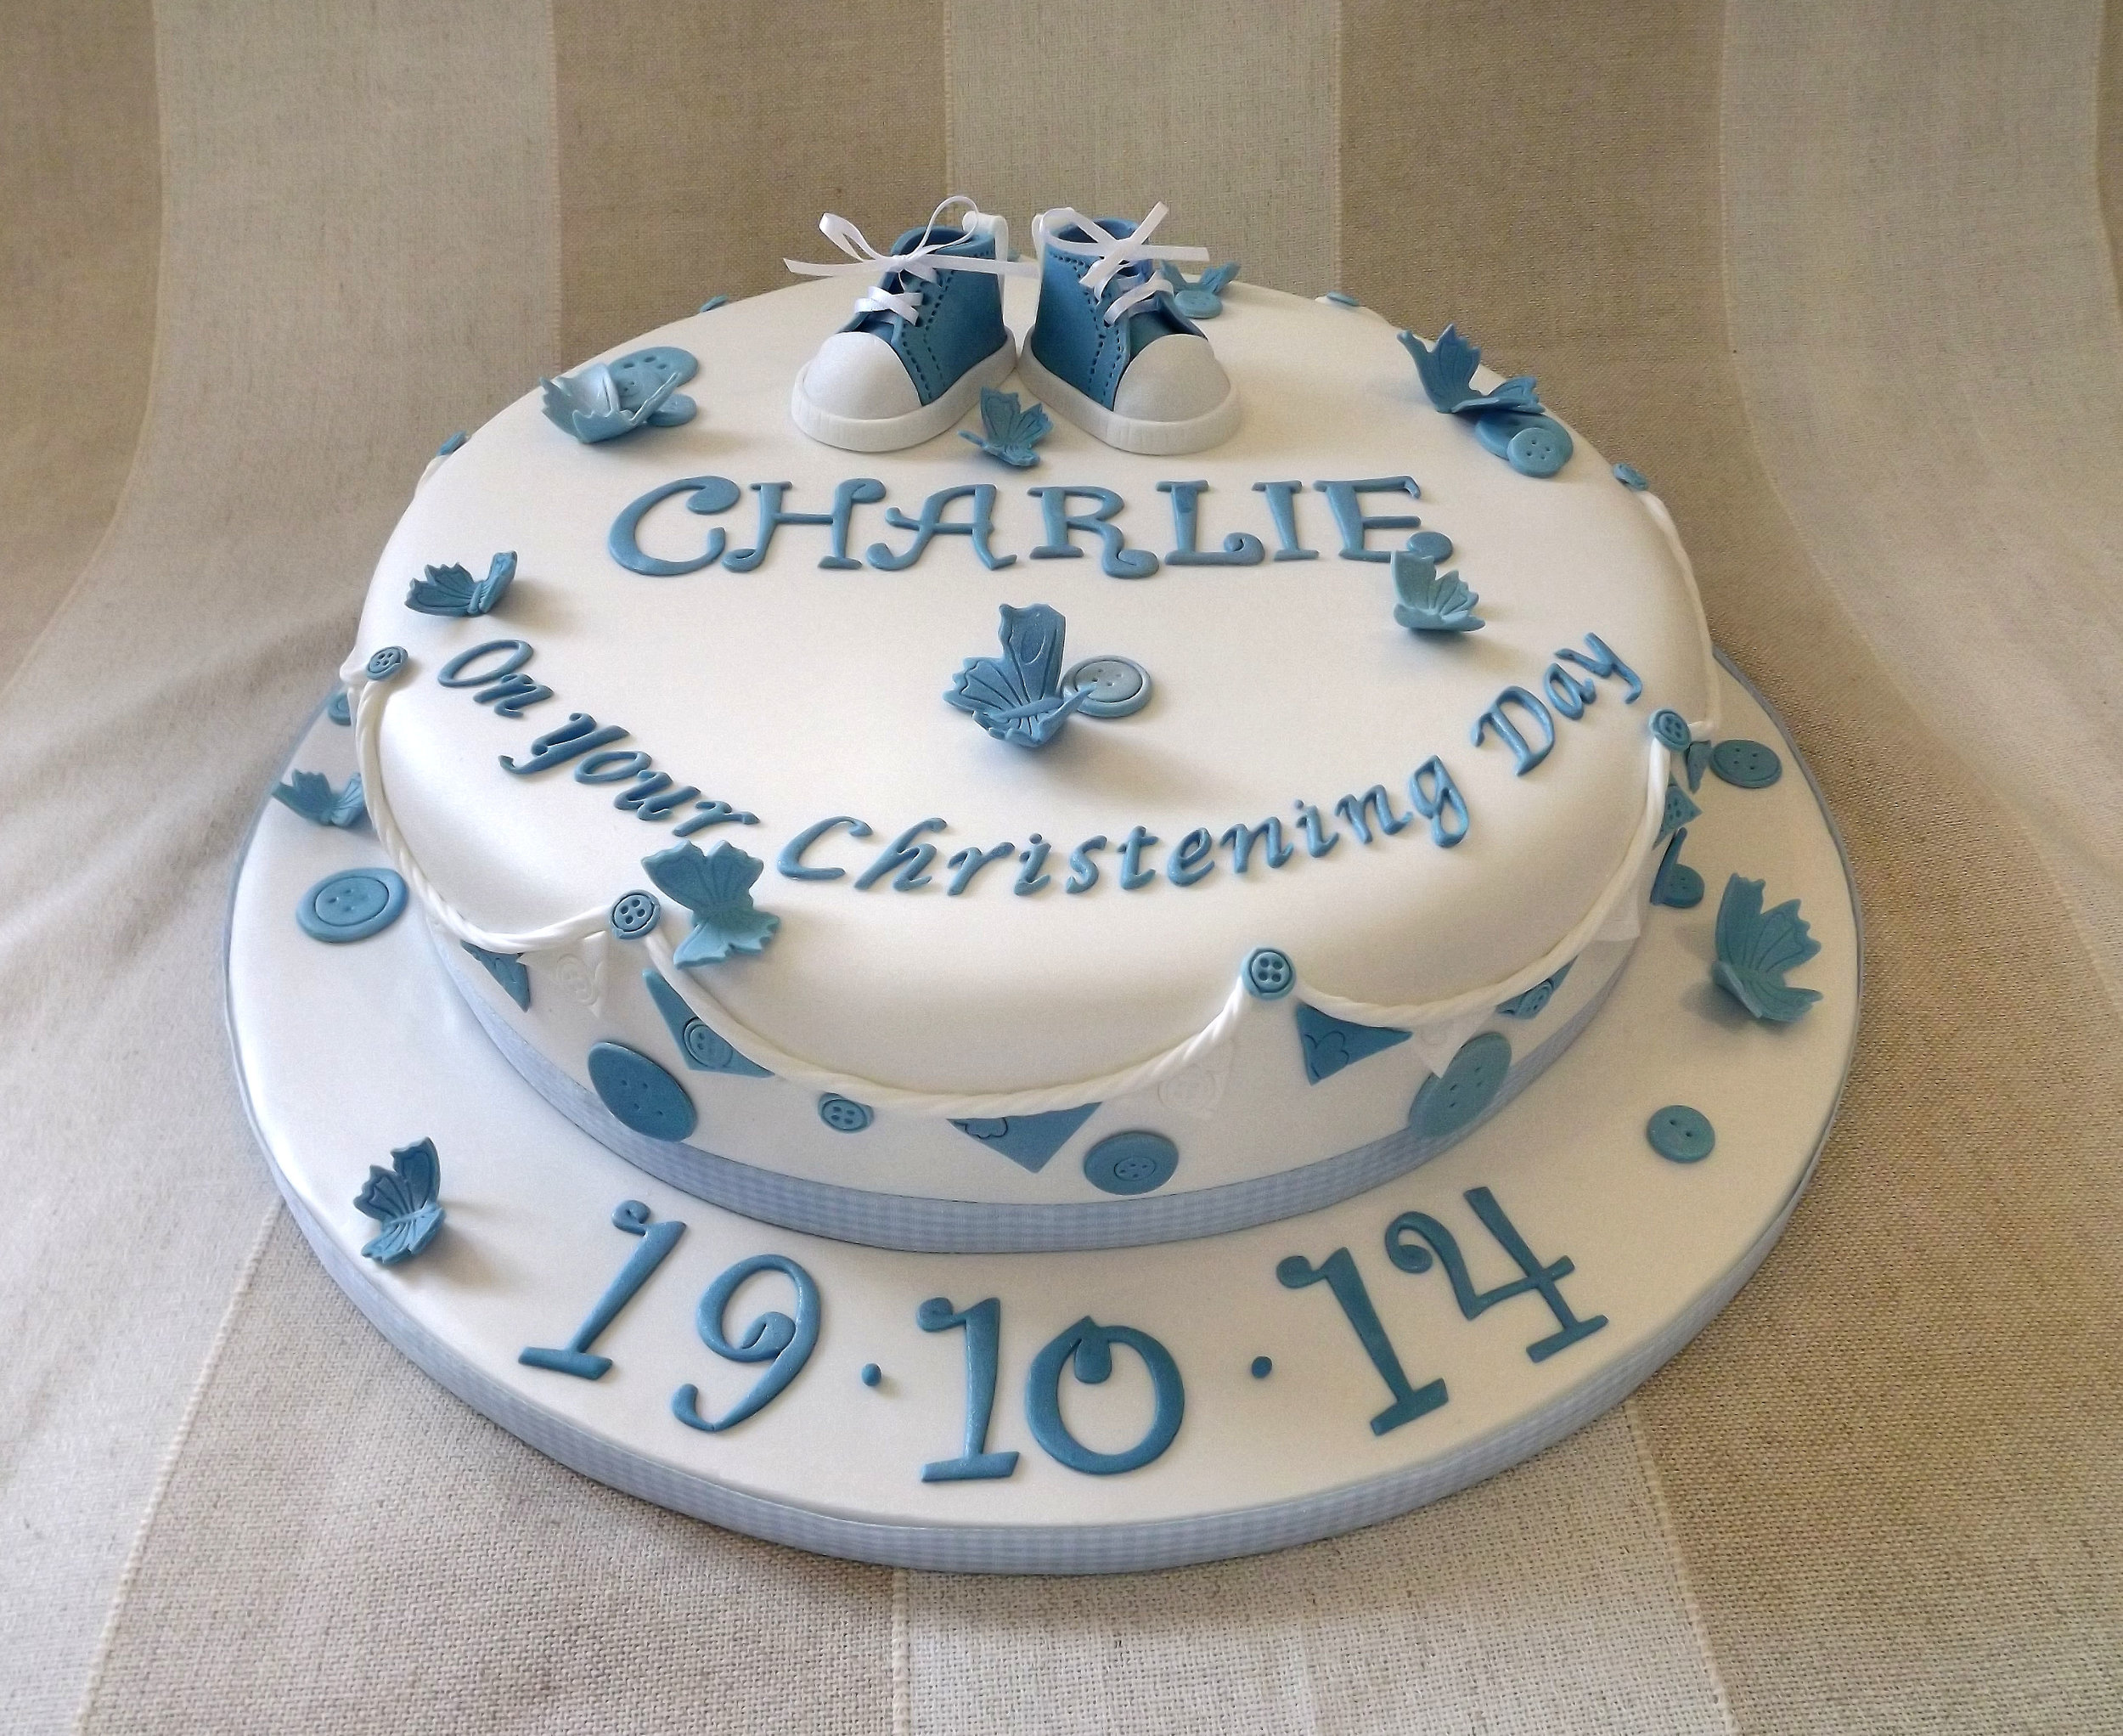 Bootie Christening Cake 1.jpg